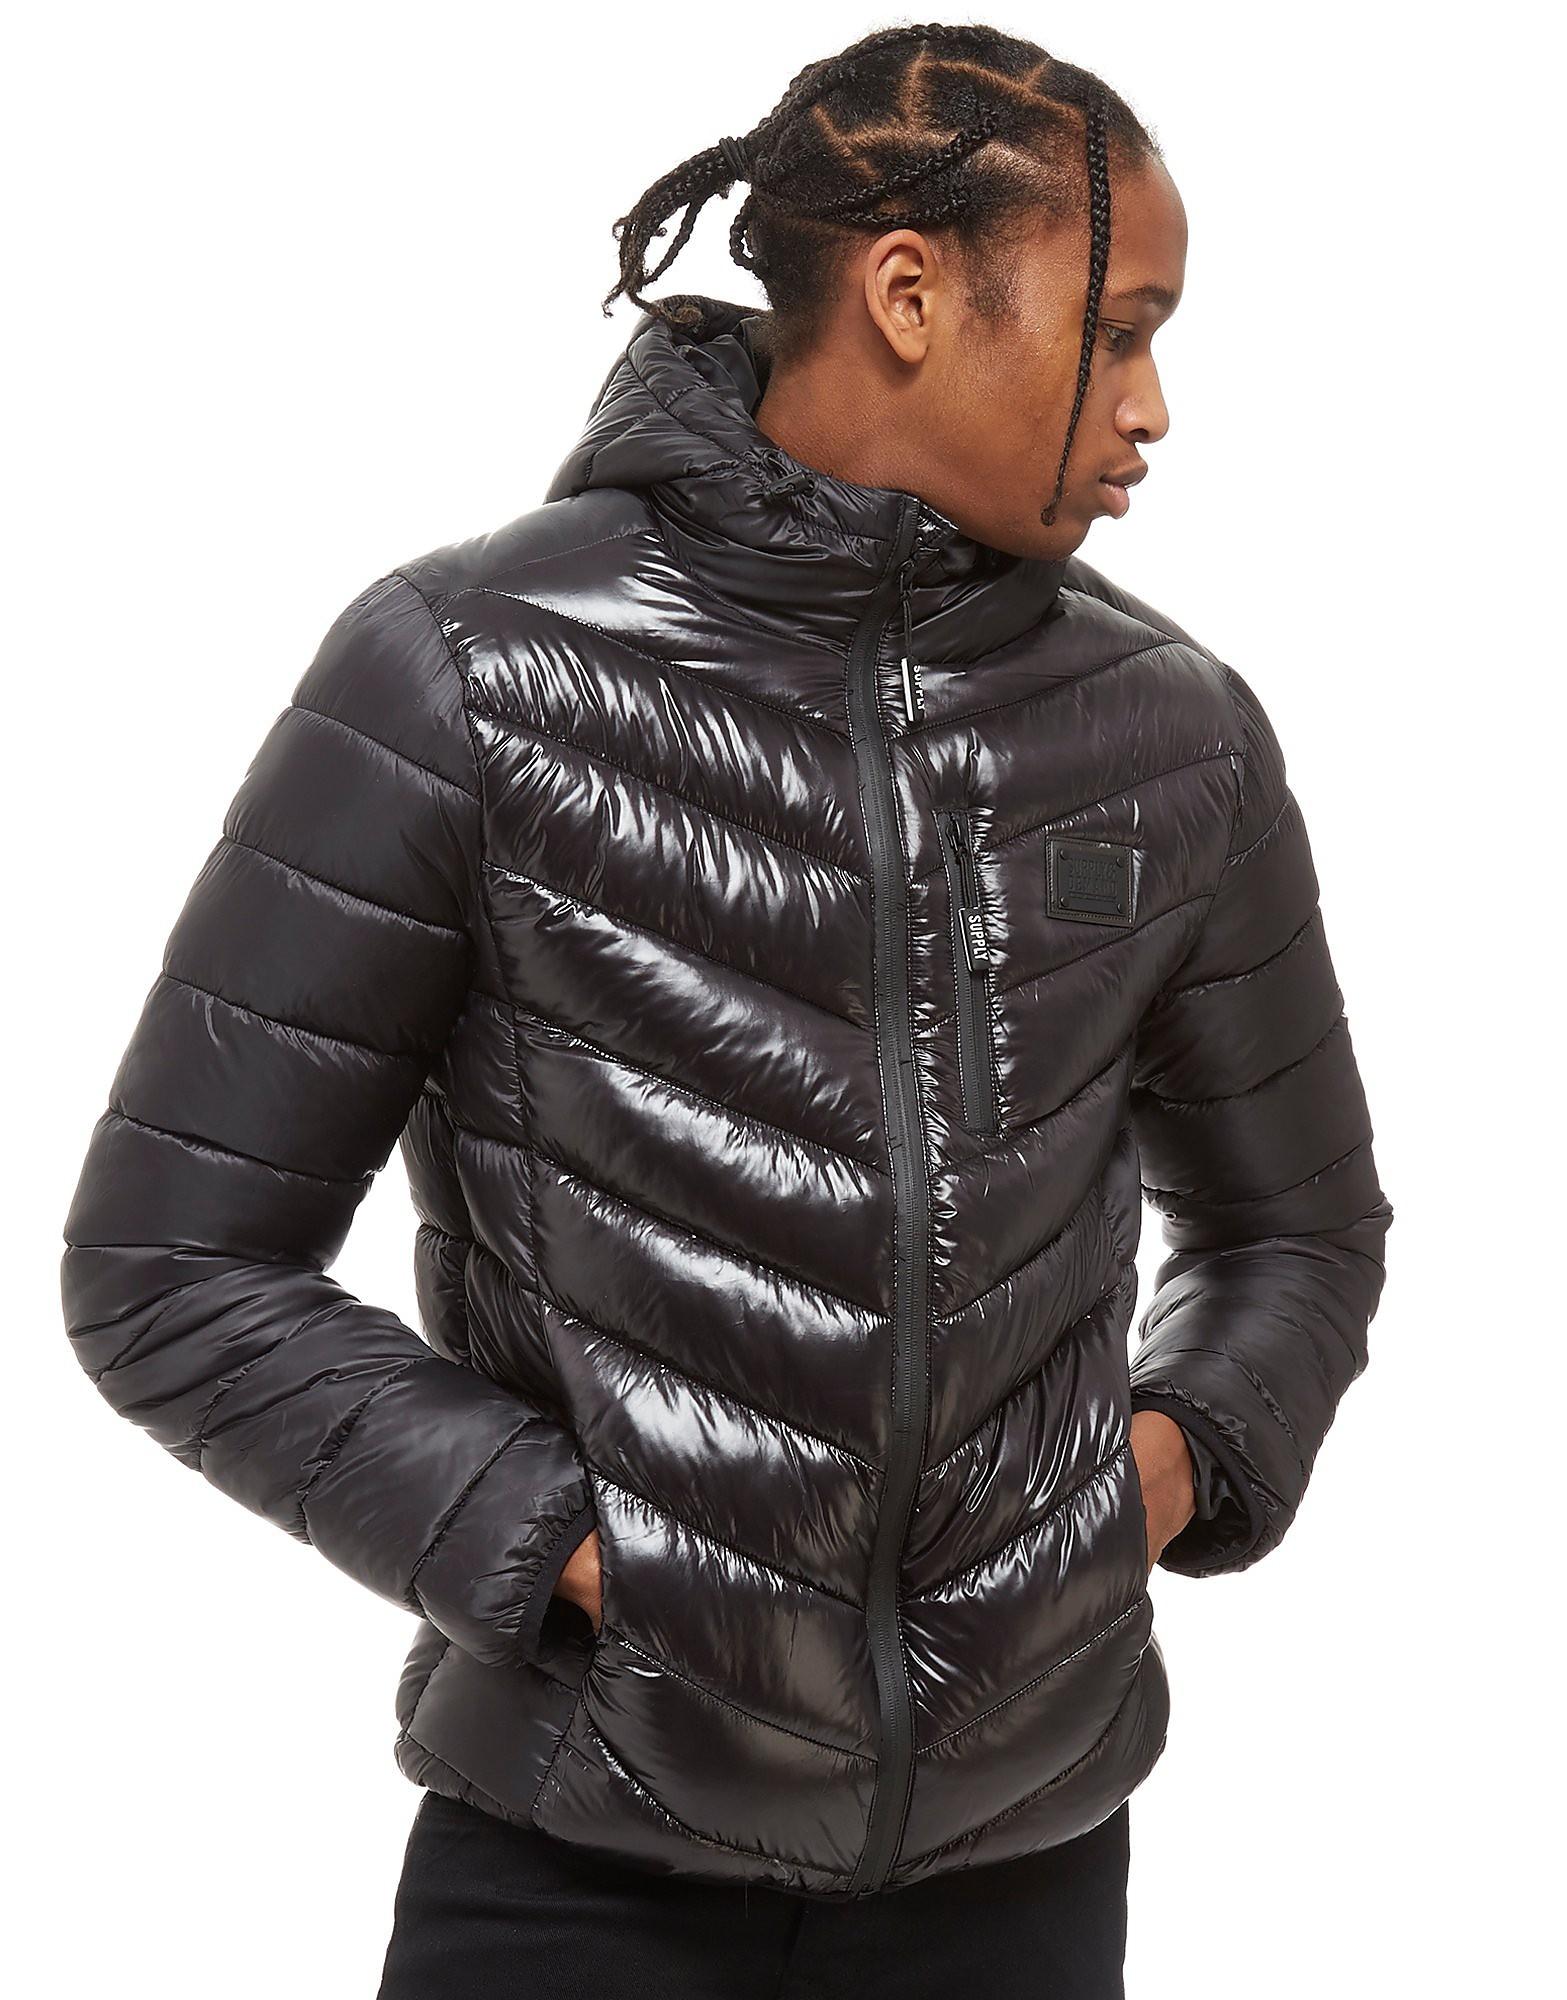 Supply & Demand Snake Jacket